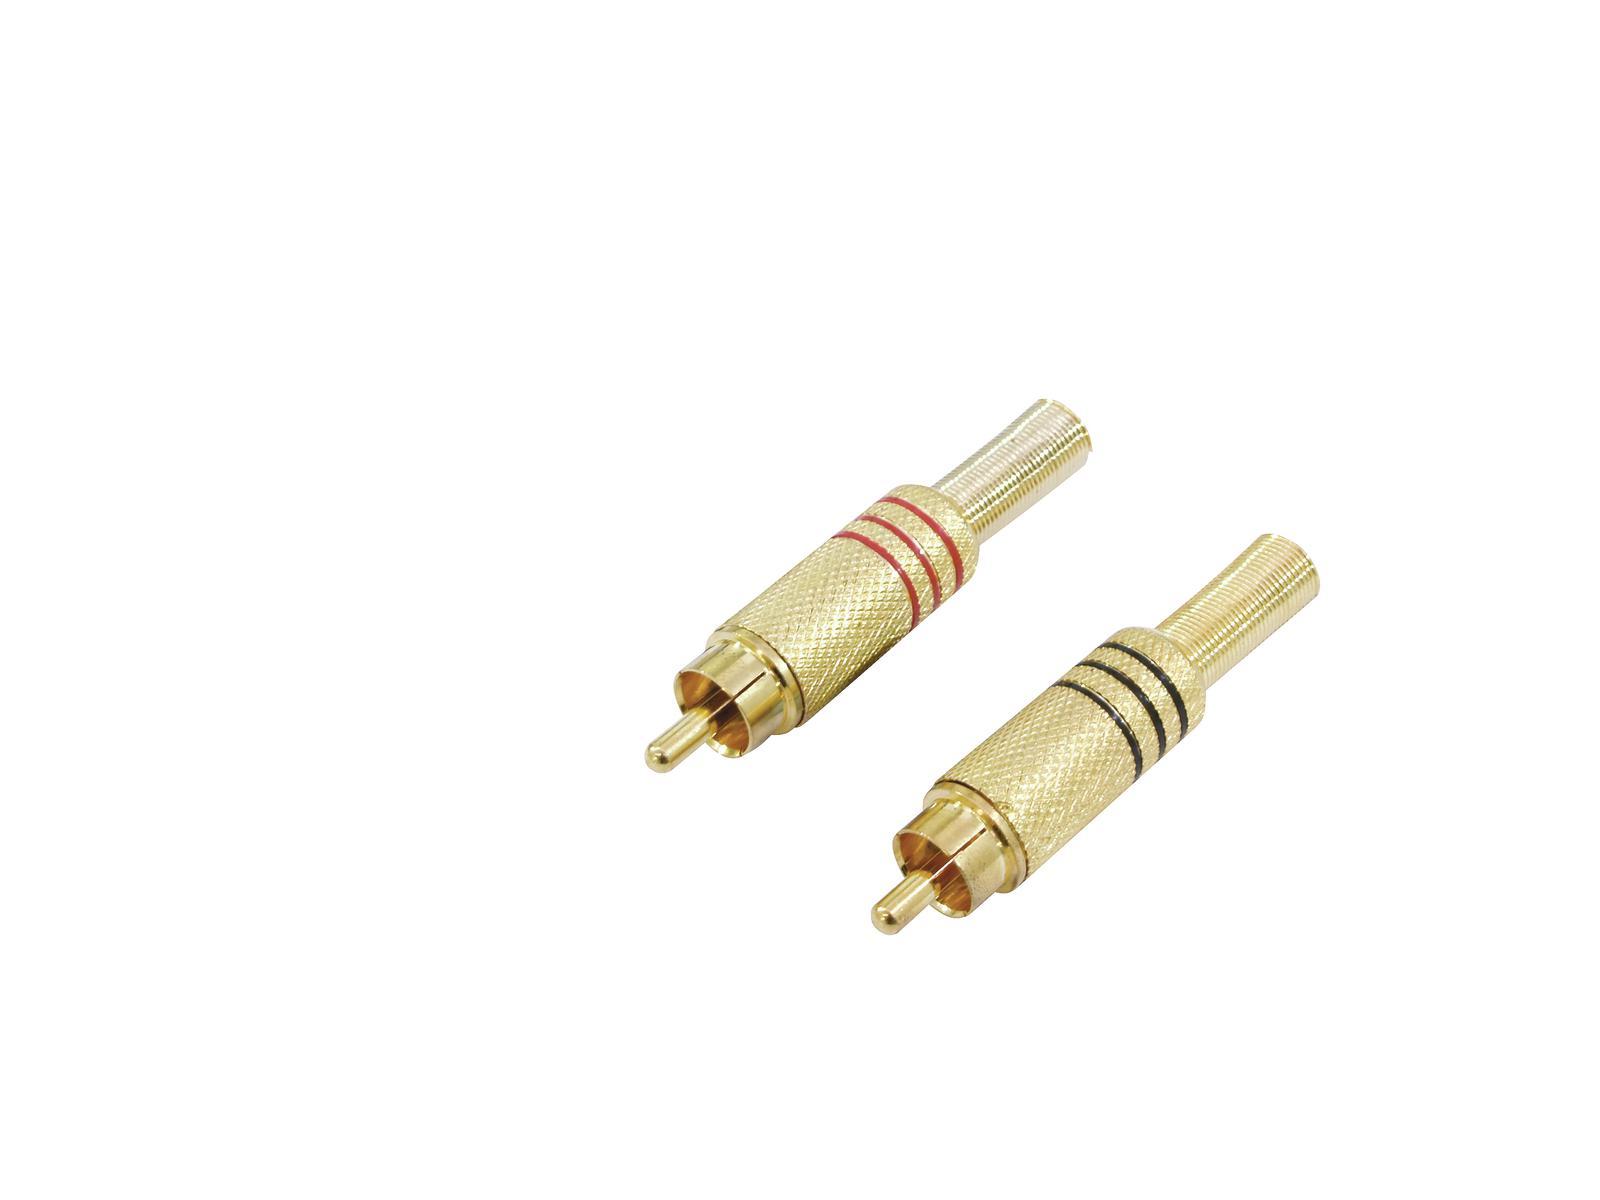 OMNITRONIC spina RCA placcati in oro 7mm rd/bk 2x